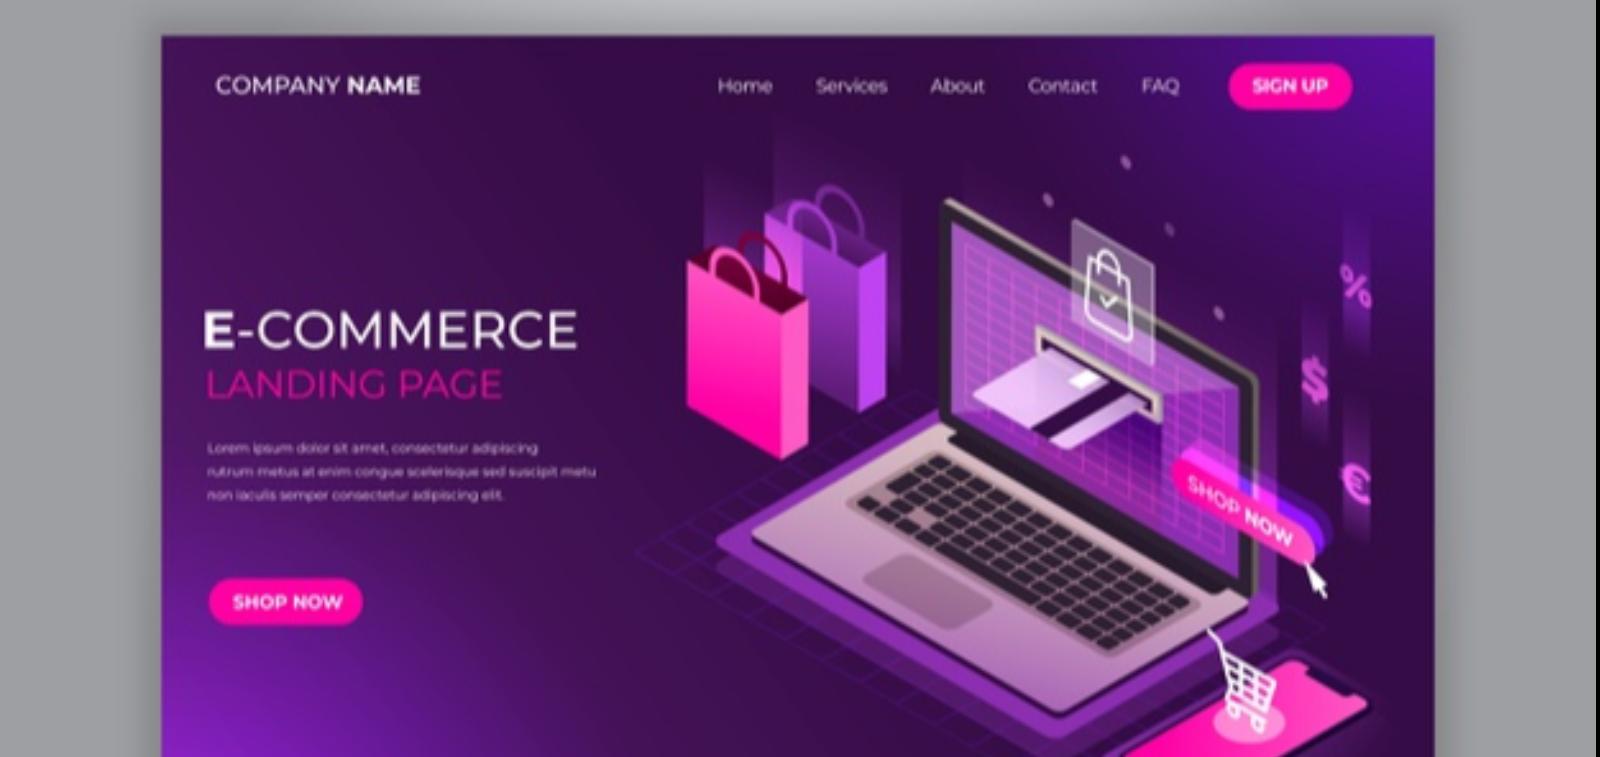 E-Tcarette Satış Yapmak Çok Kolay